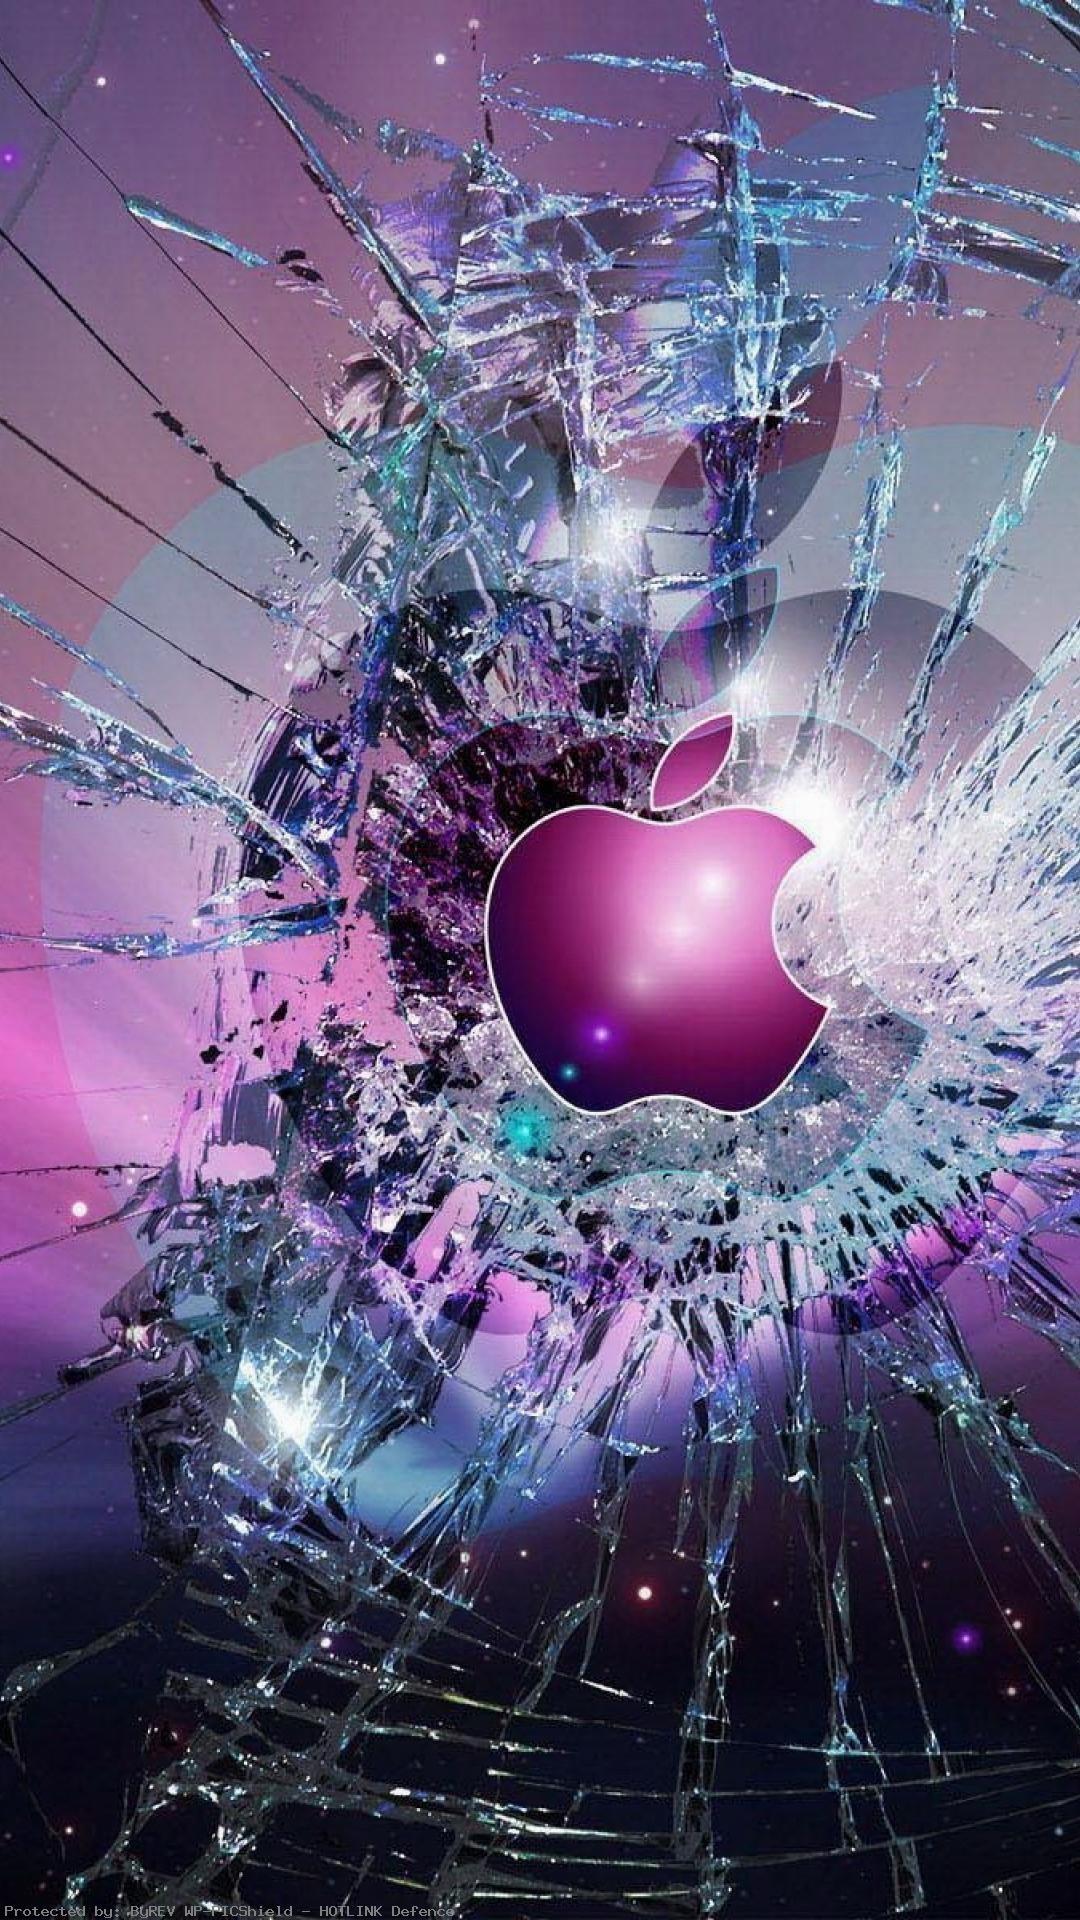 cool-lock-screen-broken-glass-iphone-1080×1920-wallpaper-